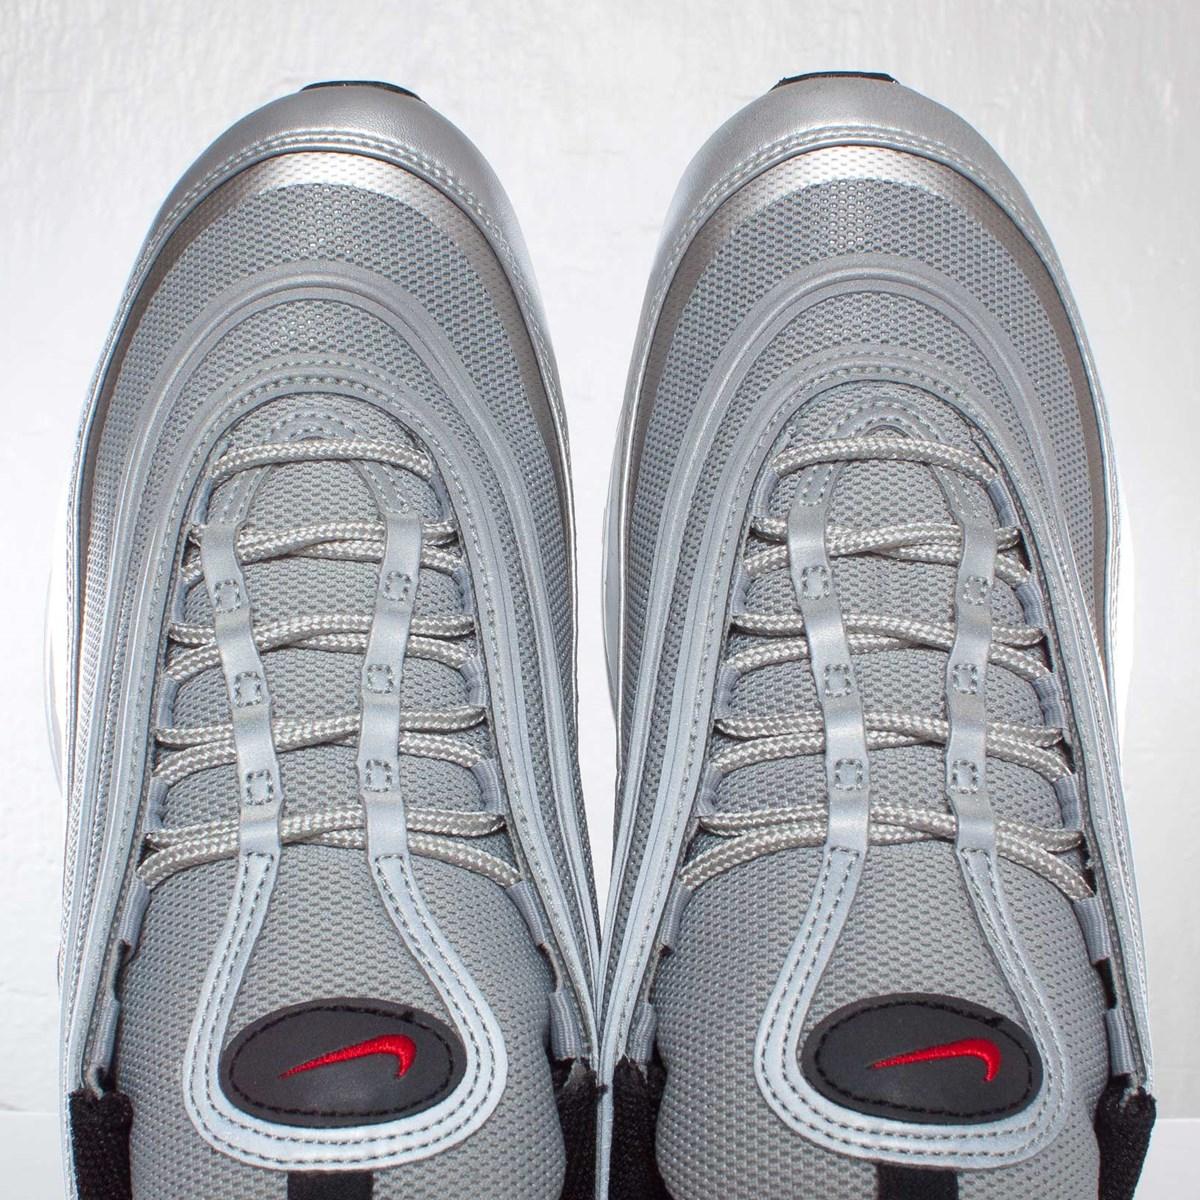 Nike Air Max 97 Premium Tape QS 624520 061